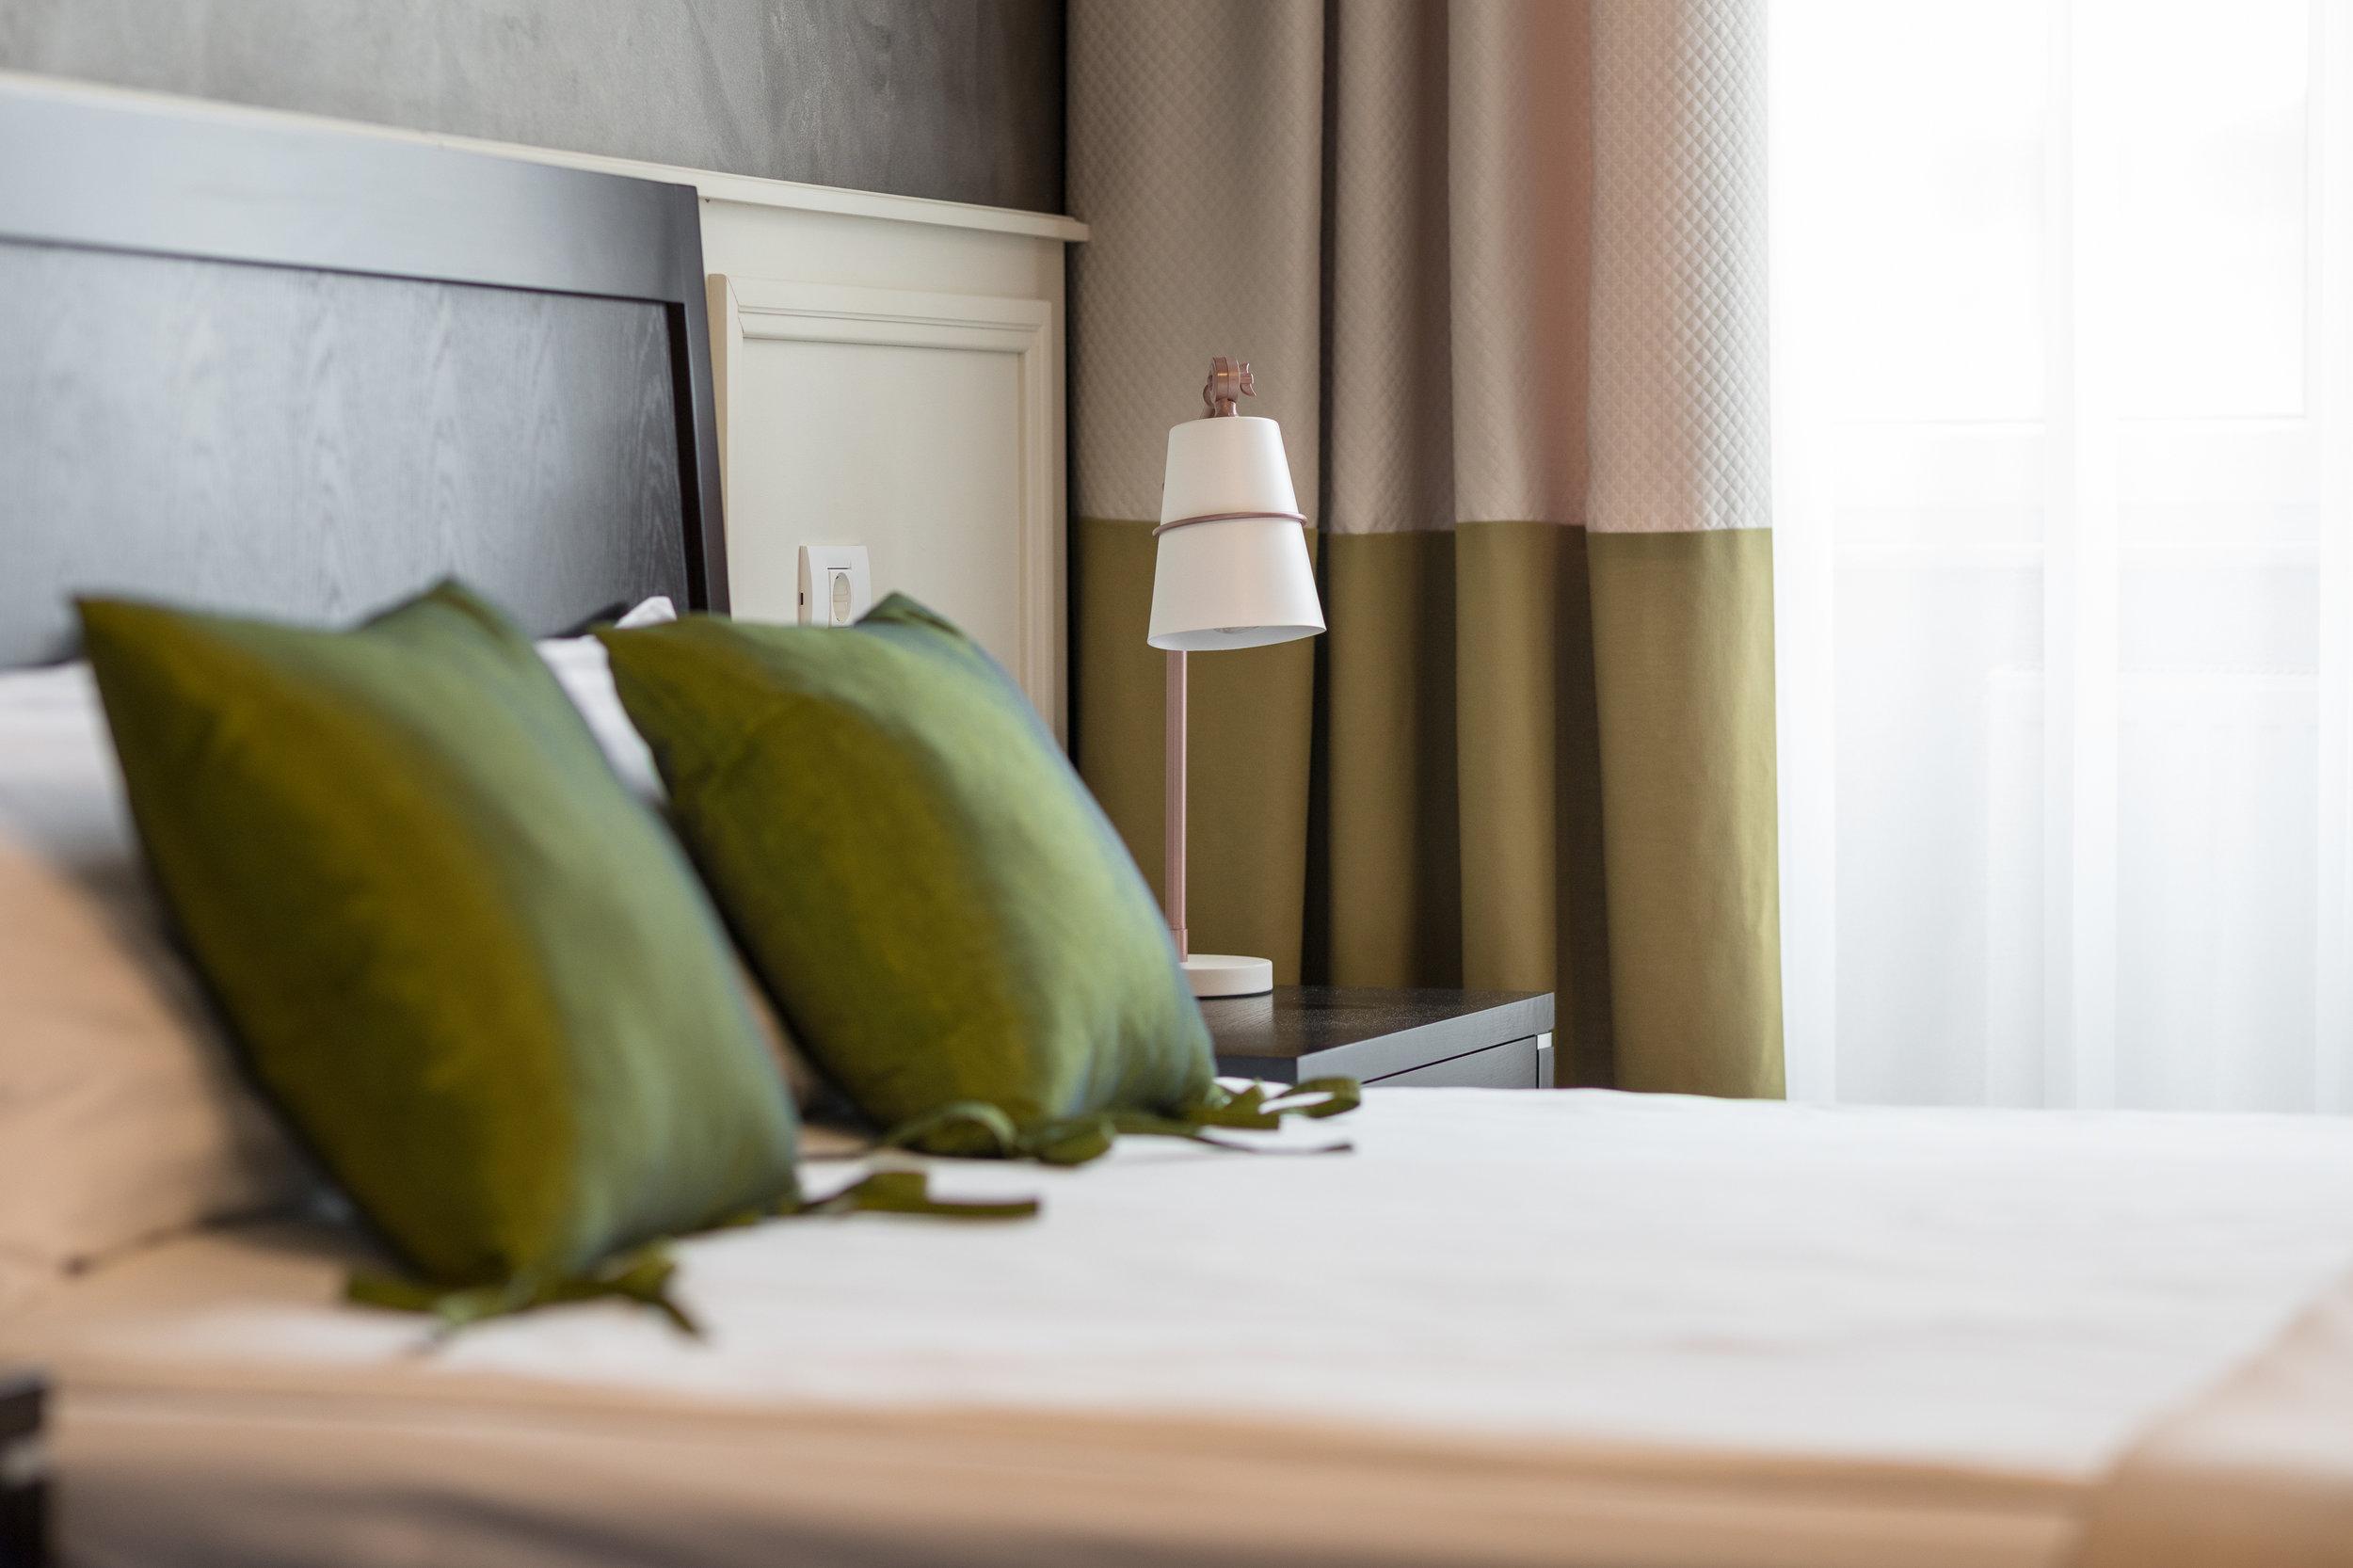 Comfortable mattress and fine linens